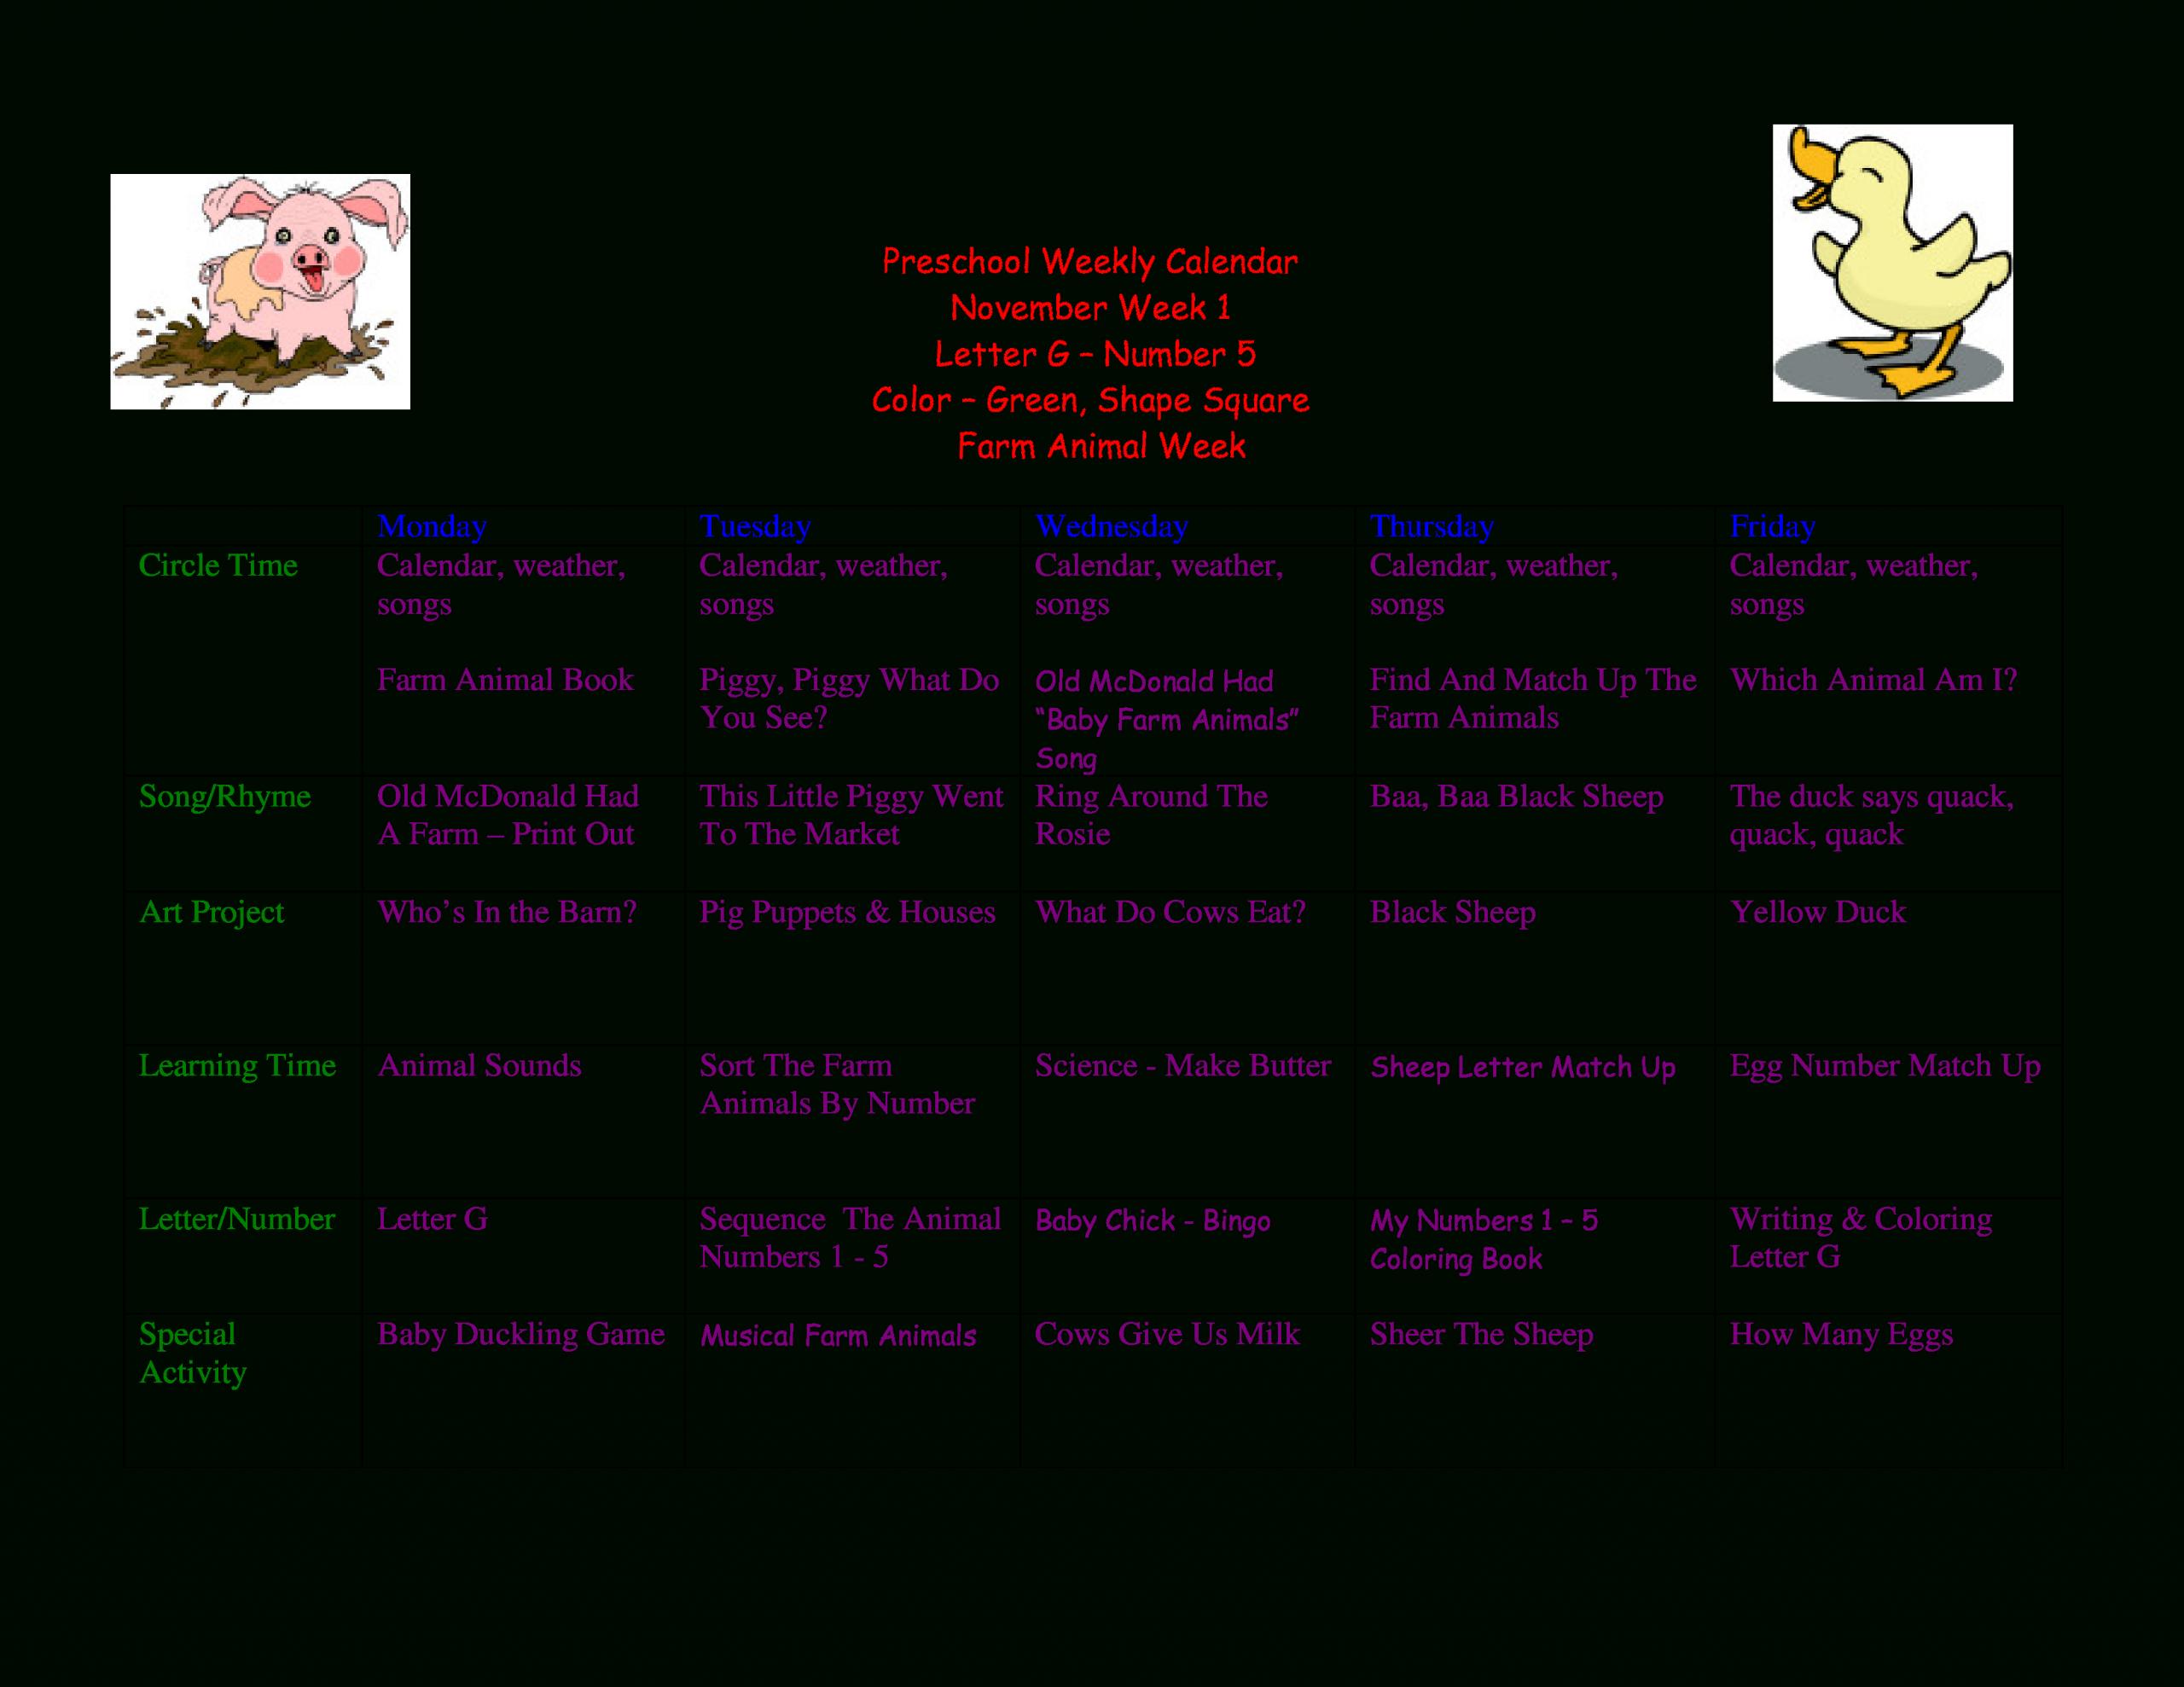 Preschool Weekly Calendar - How To Create A Preschool Create A Two Week Calendar